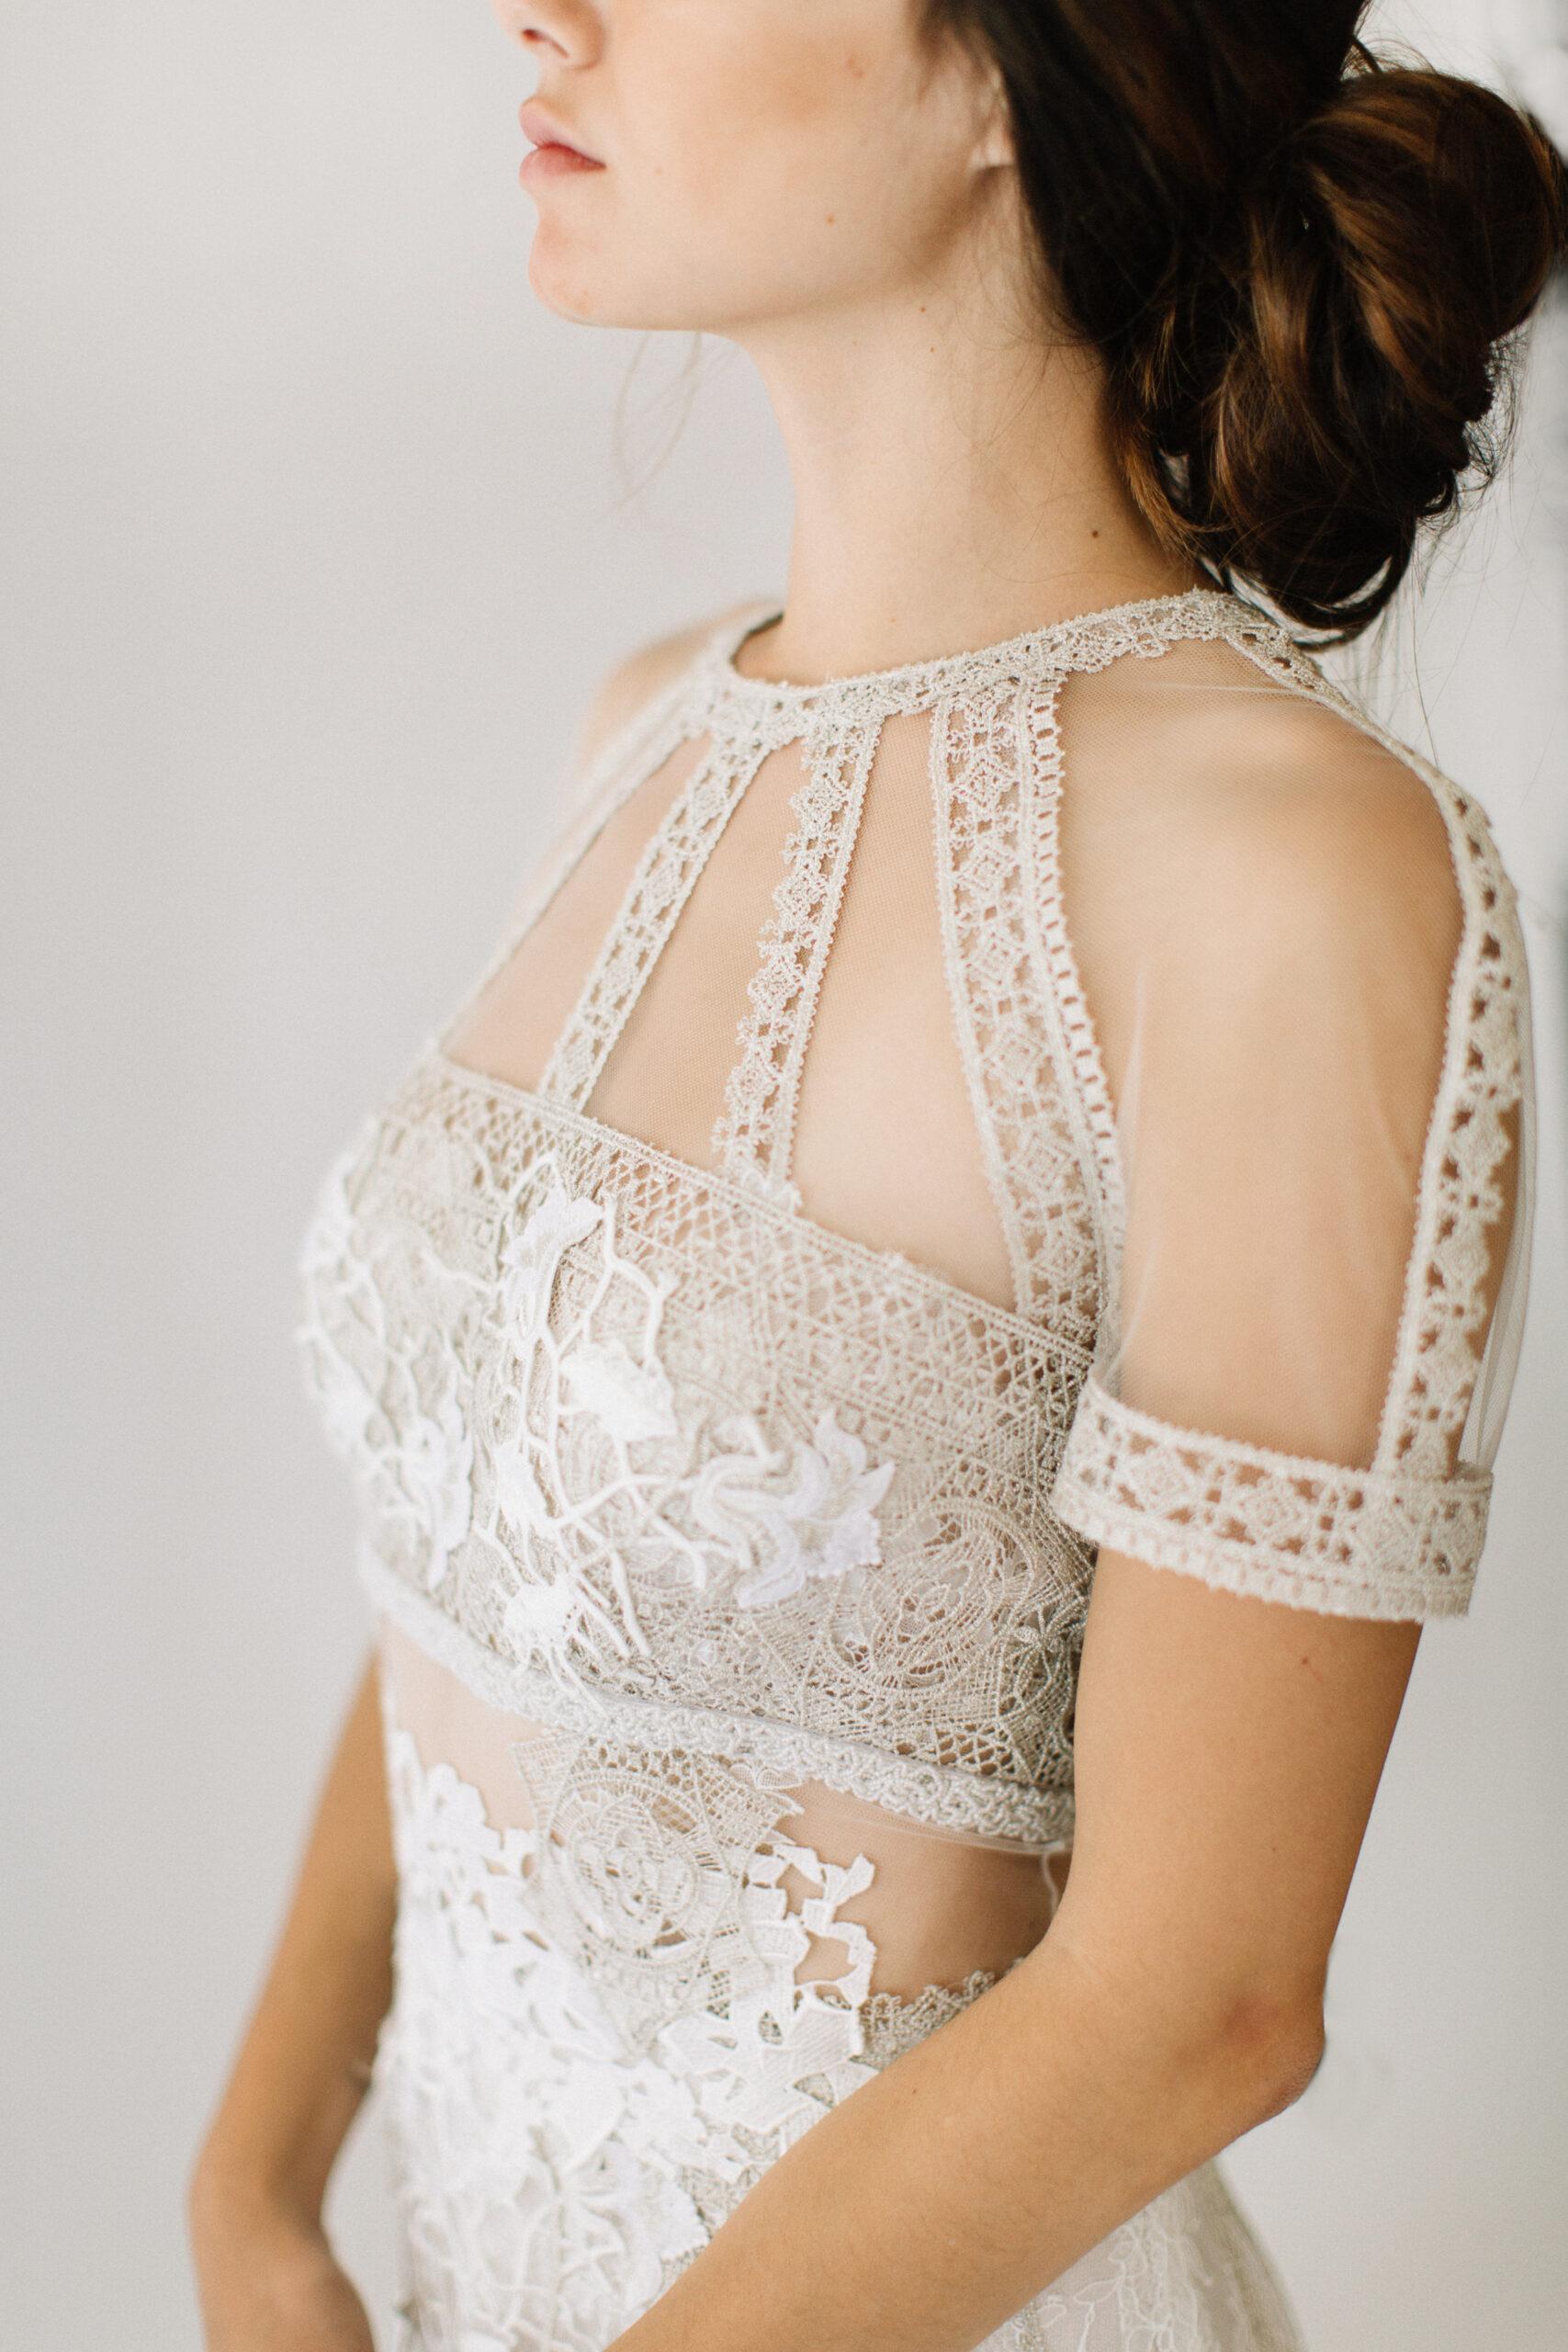 The Best Wedding Dresses for Brides With Broad Shoulders - Bloved